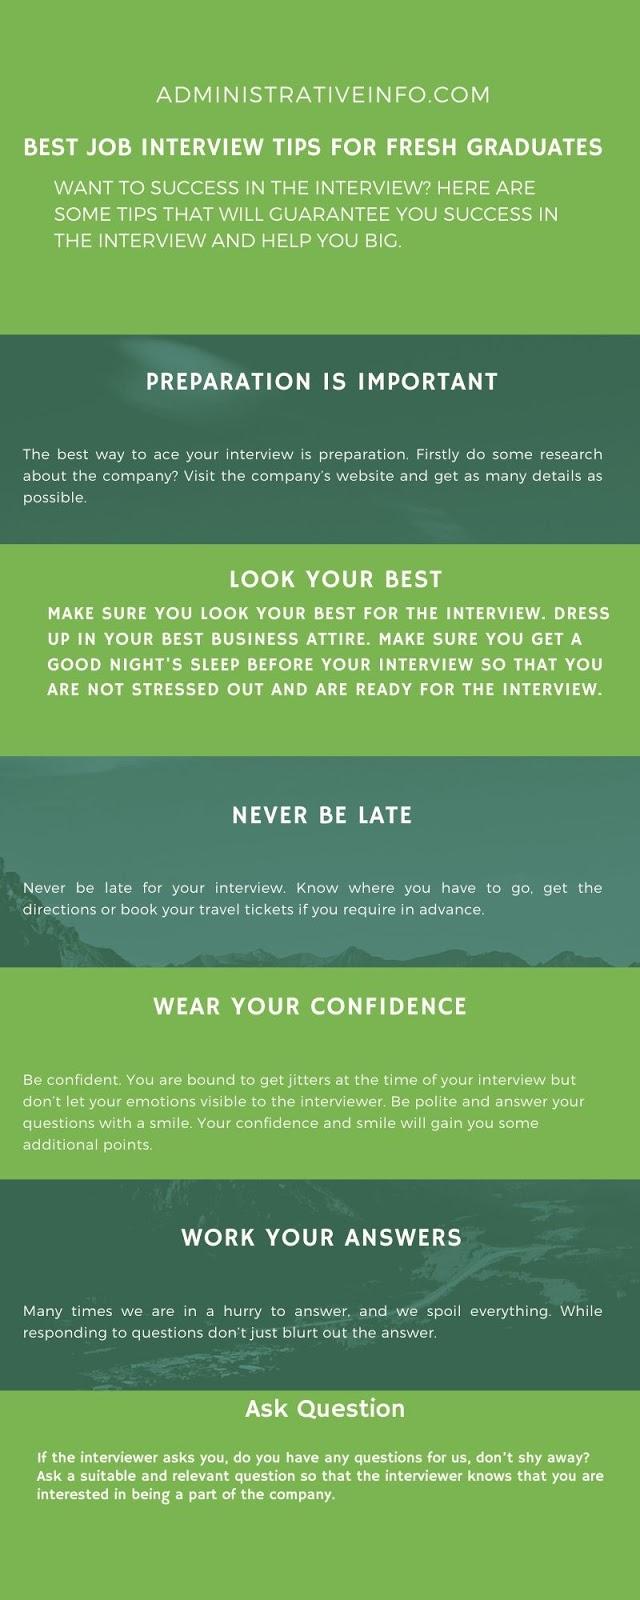 Best Job Interview Tips for Fresh Graduates